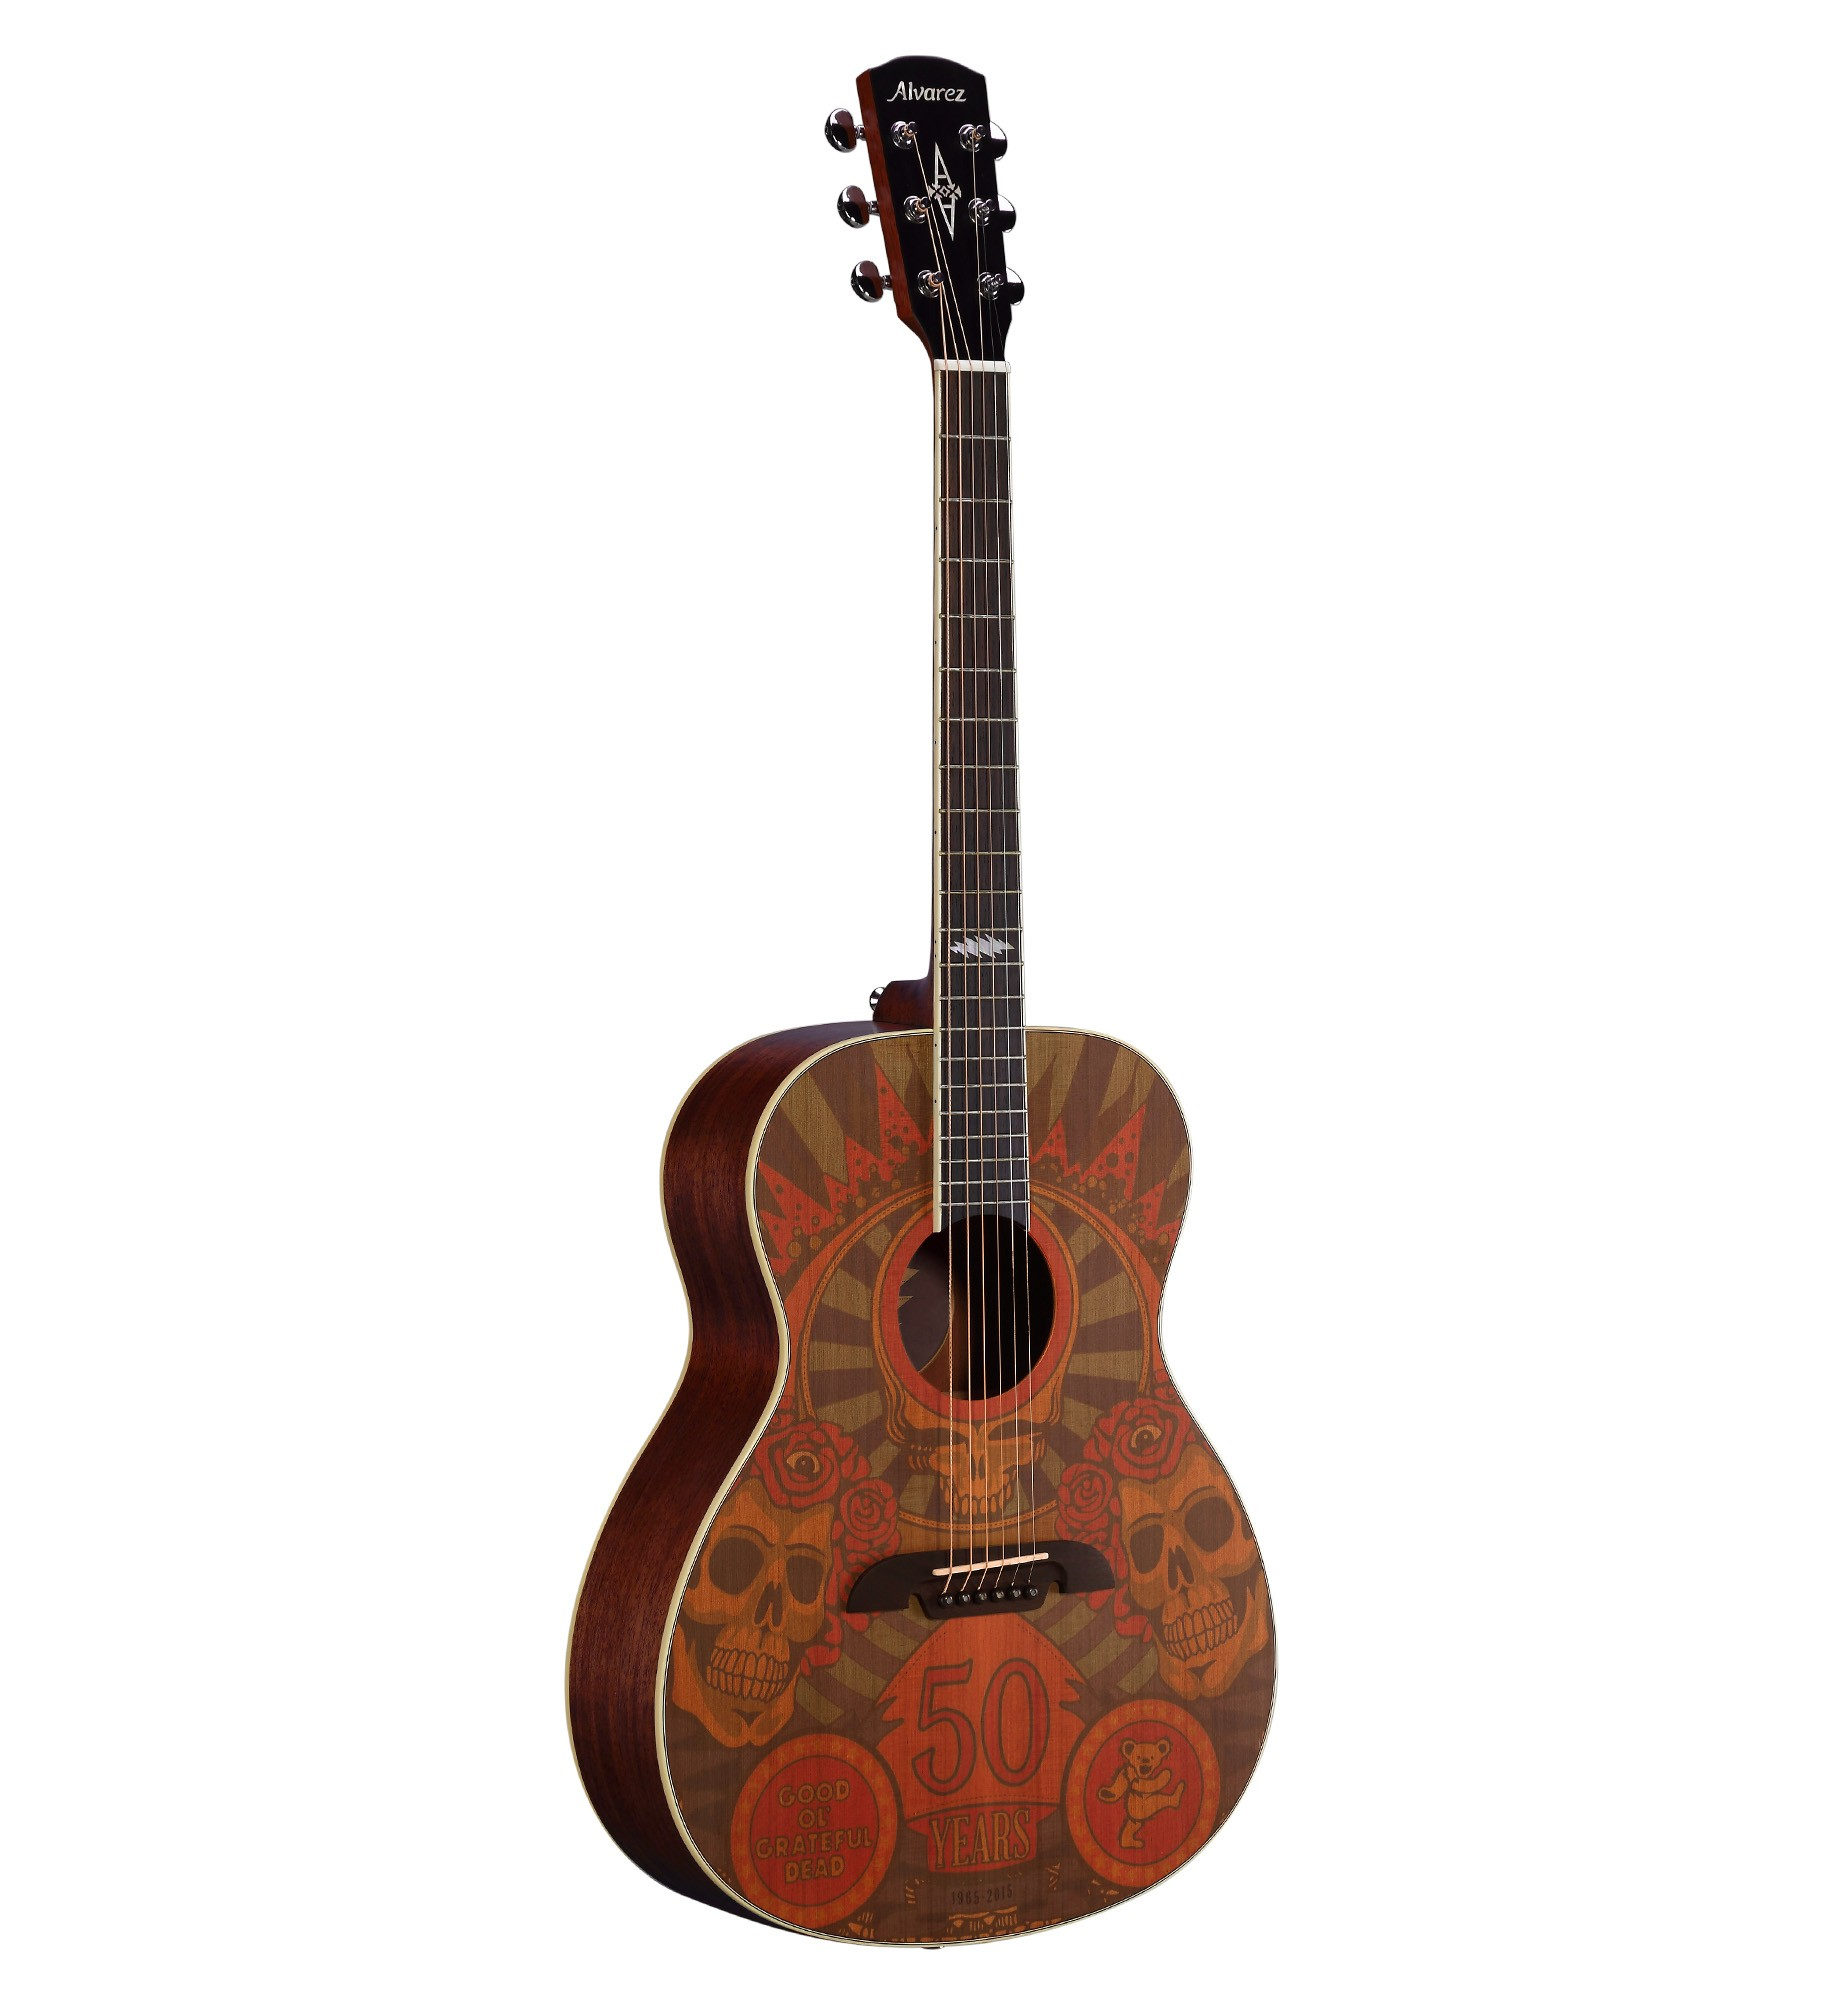 Dating a yairi guitar